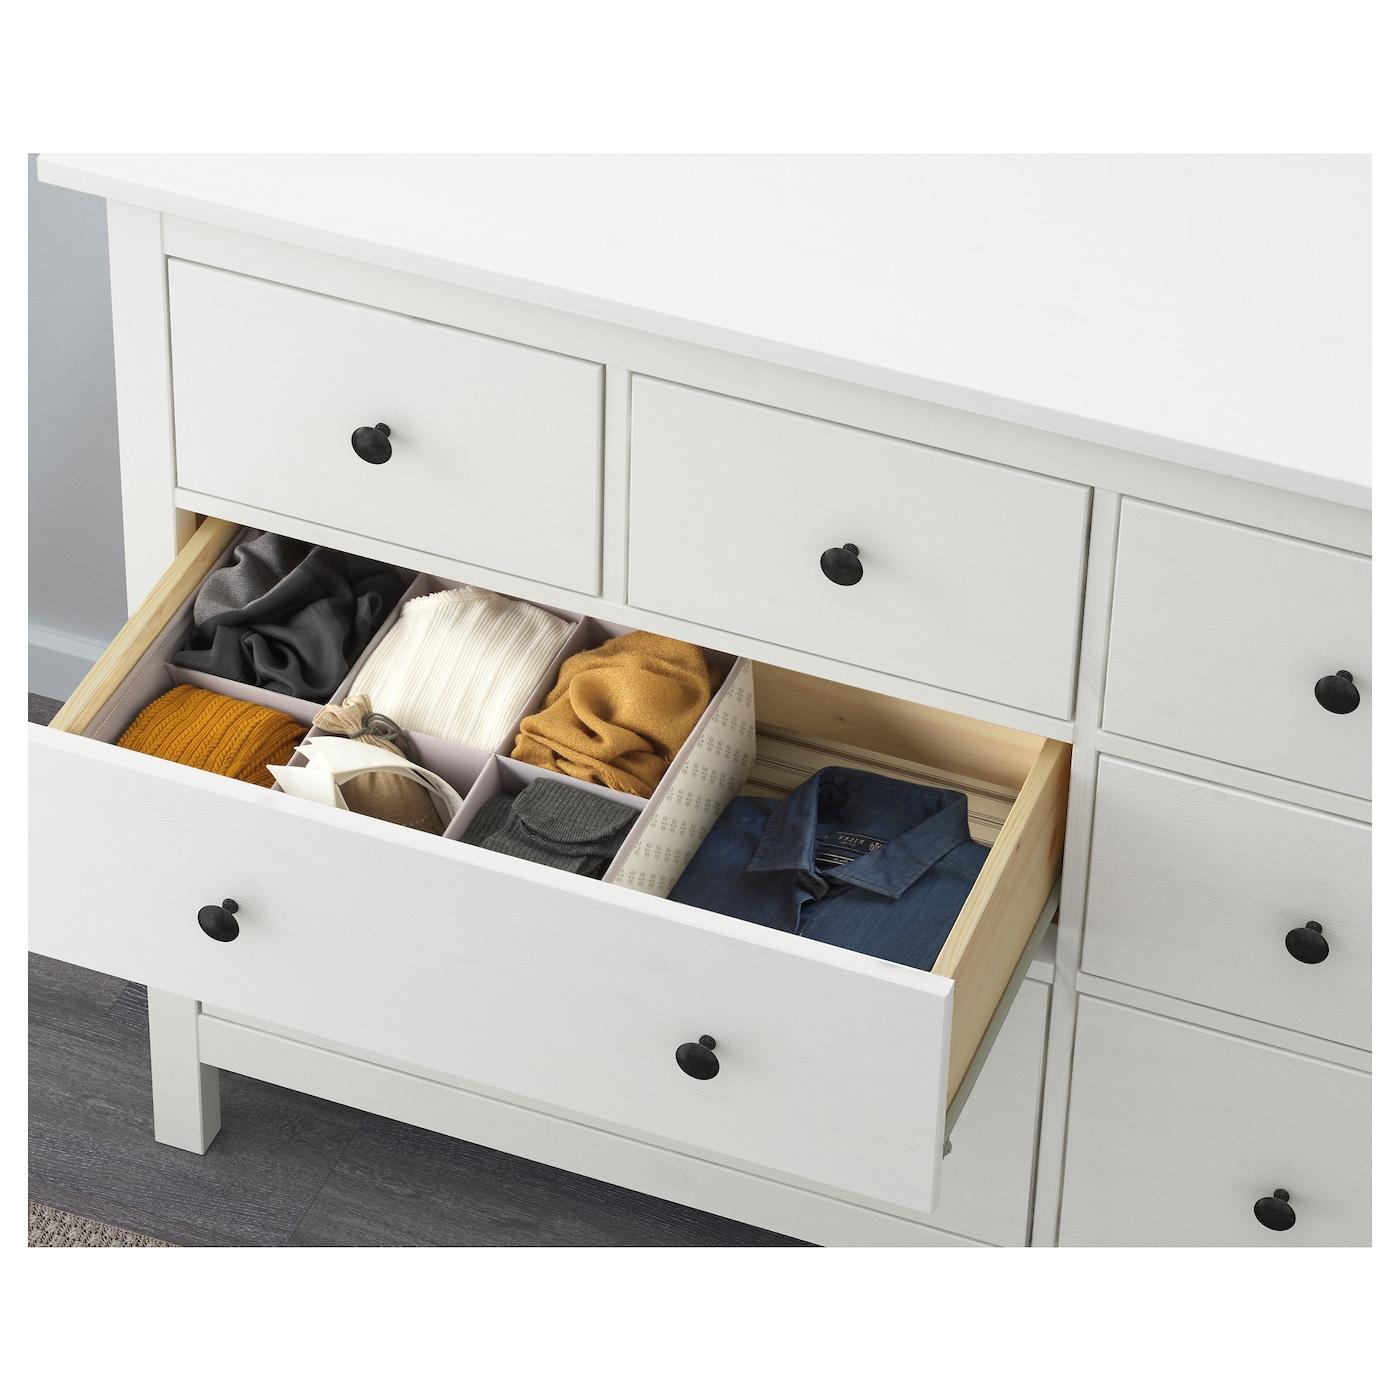 Ikea Shoe Drawers Hemnes Chest Of 8 Drawers White 160x96 Cm Ikea